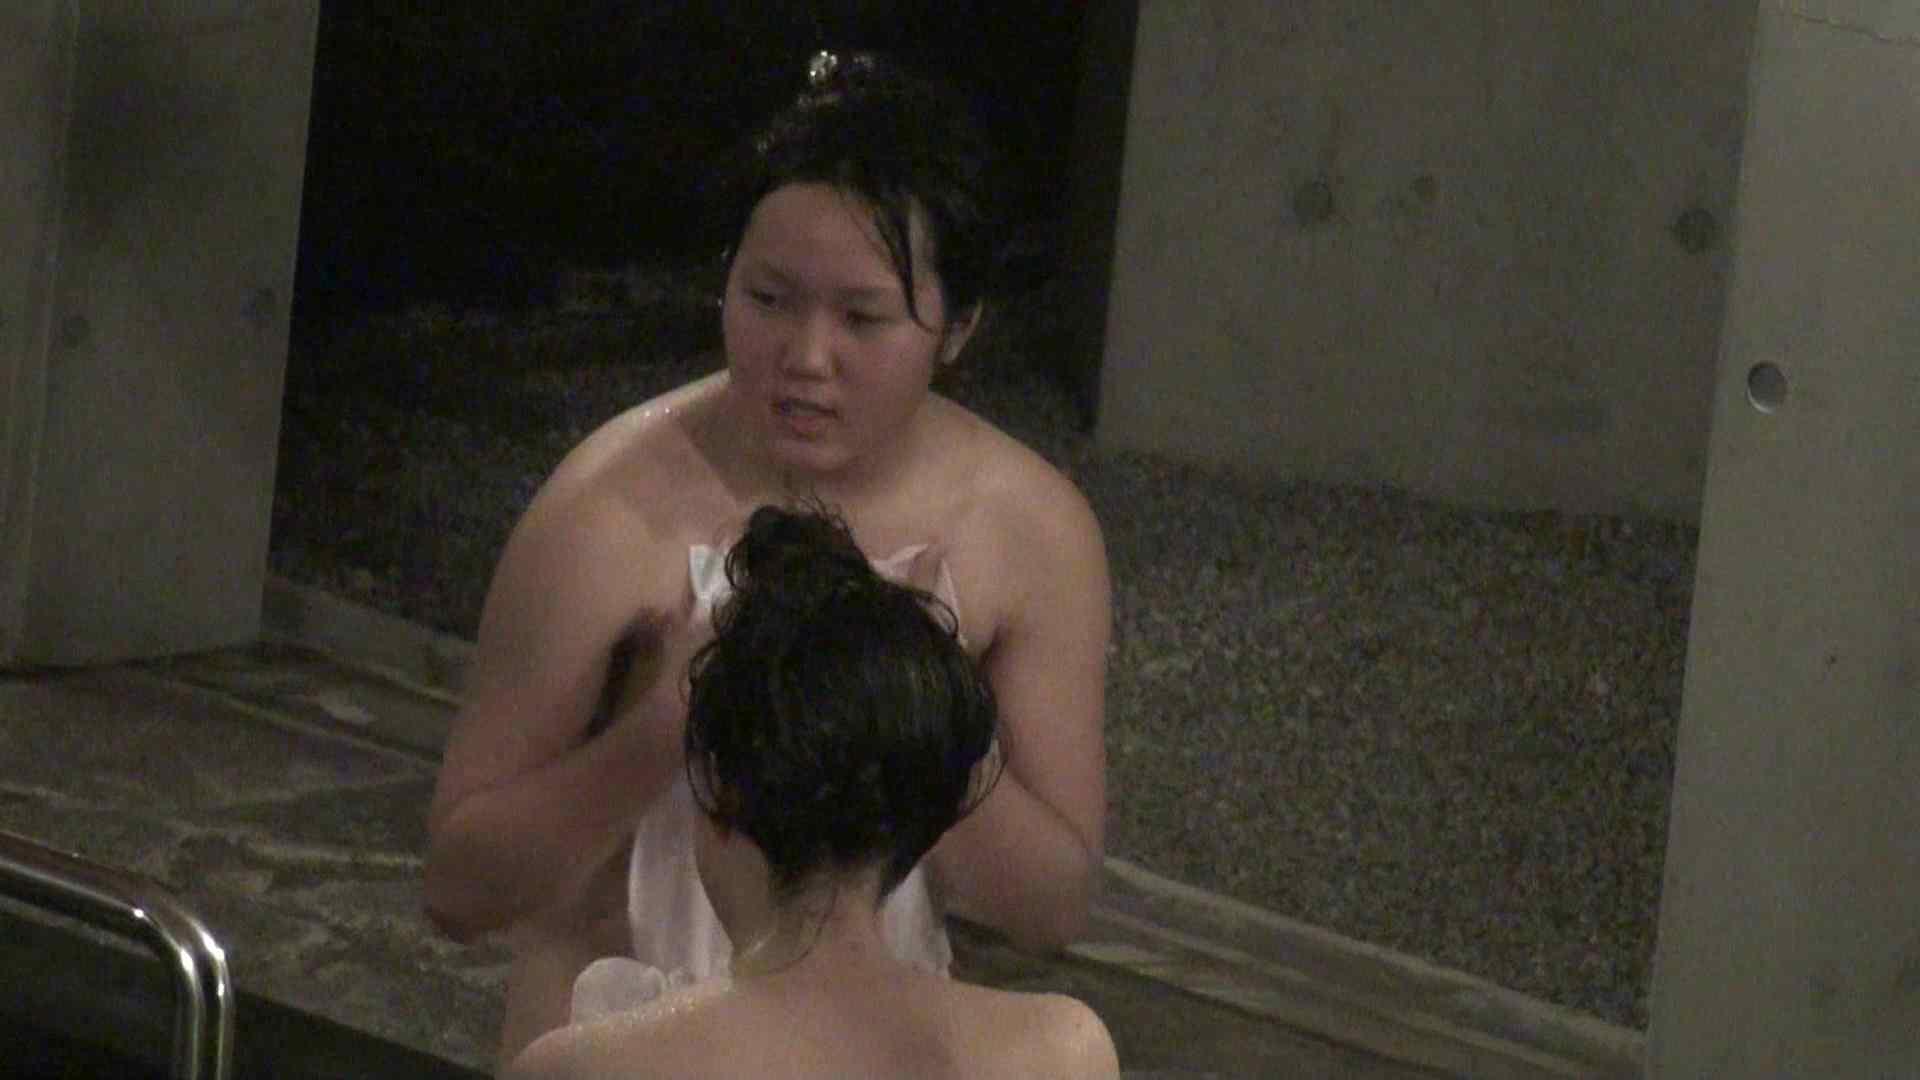 Aquaな露天風呂Vol.382 OLセックス | 盗撮  90画像 79